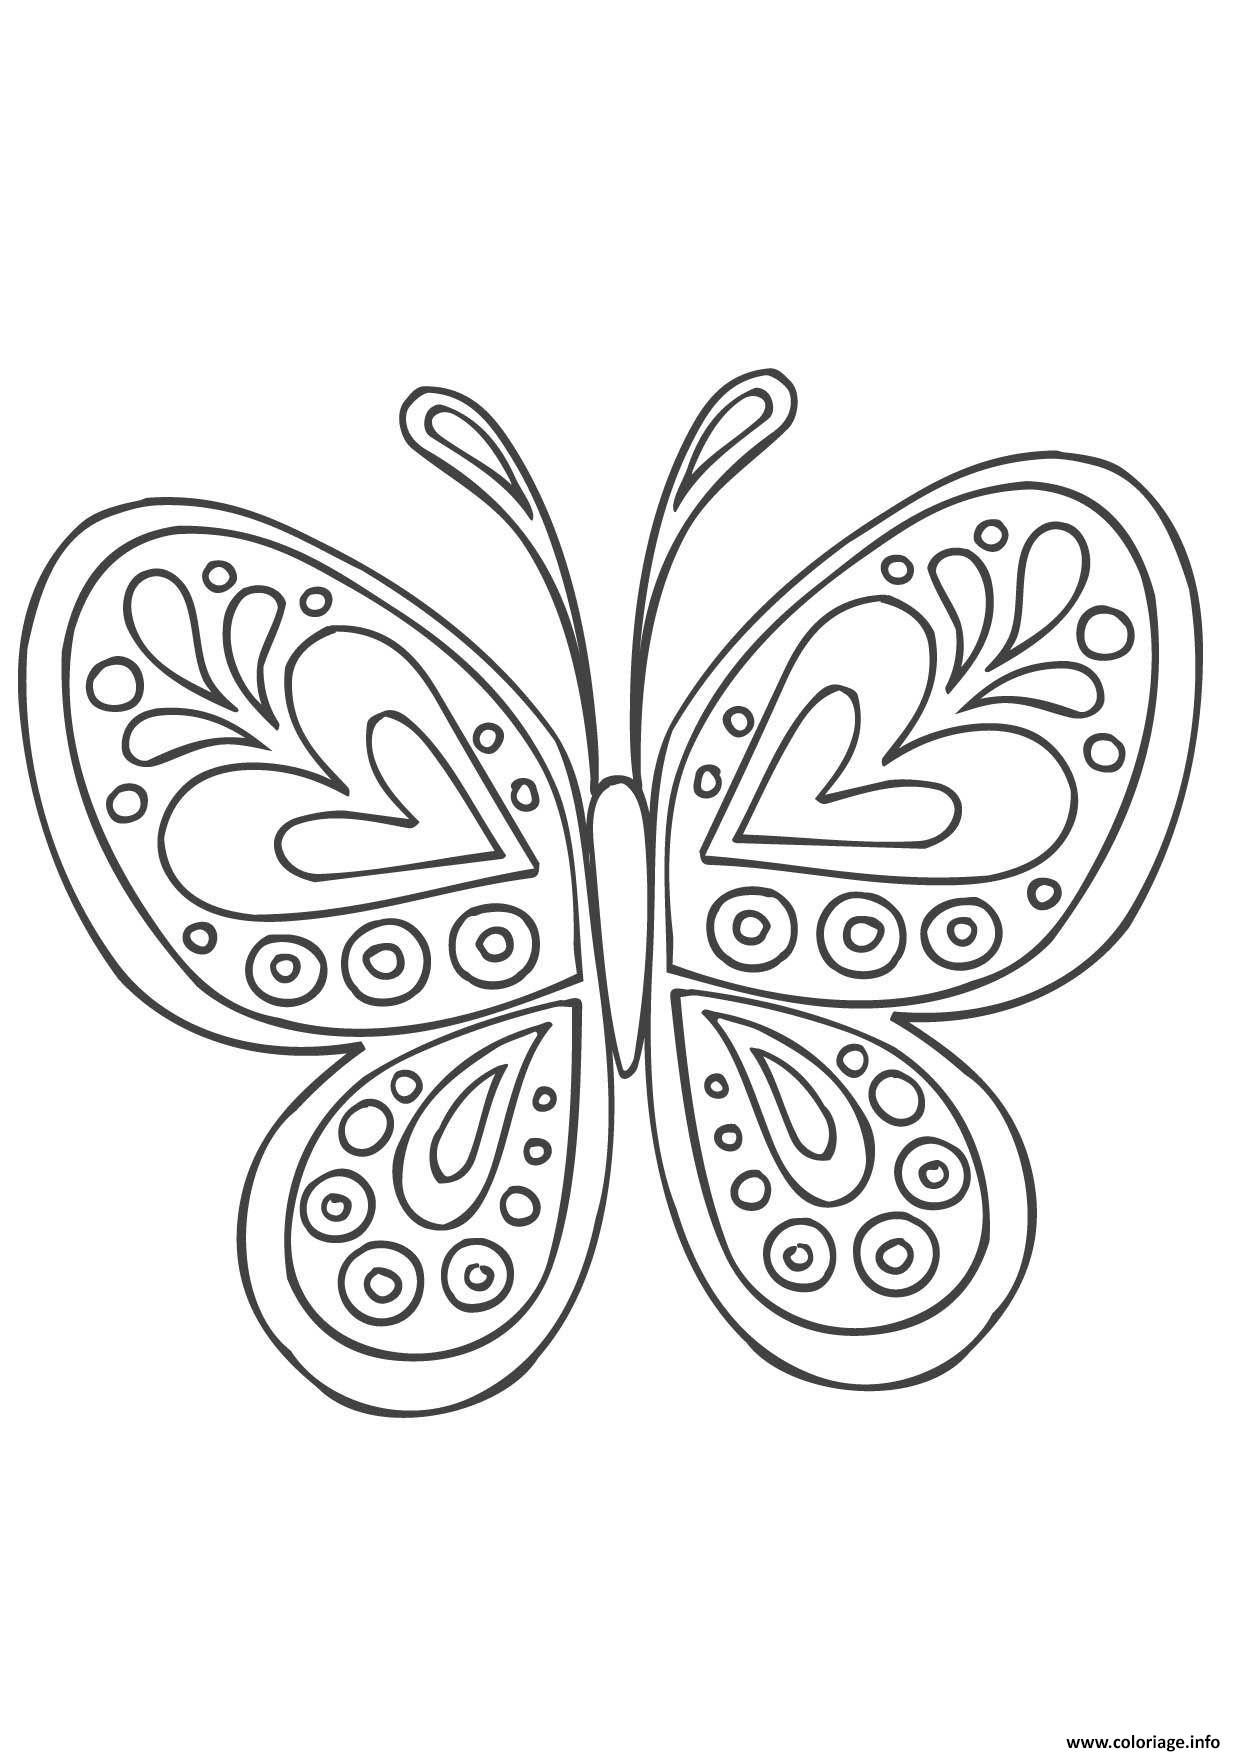 Coloriage Mandala Papillon Dessin